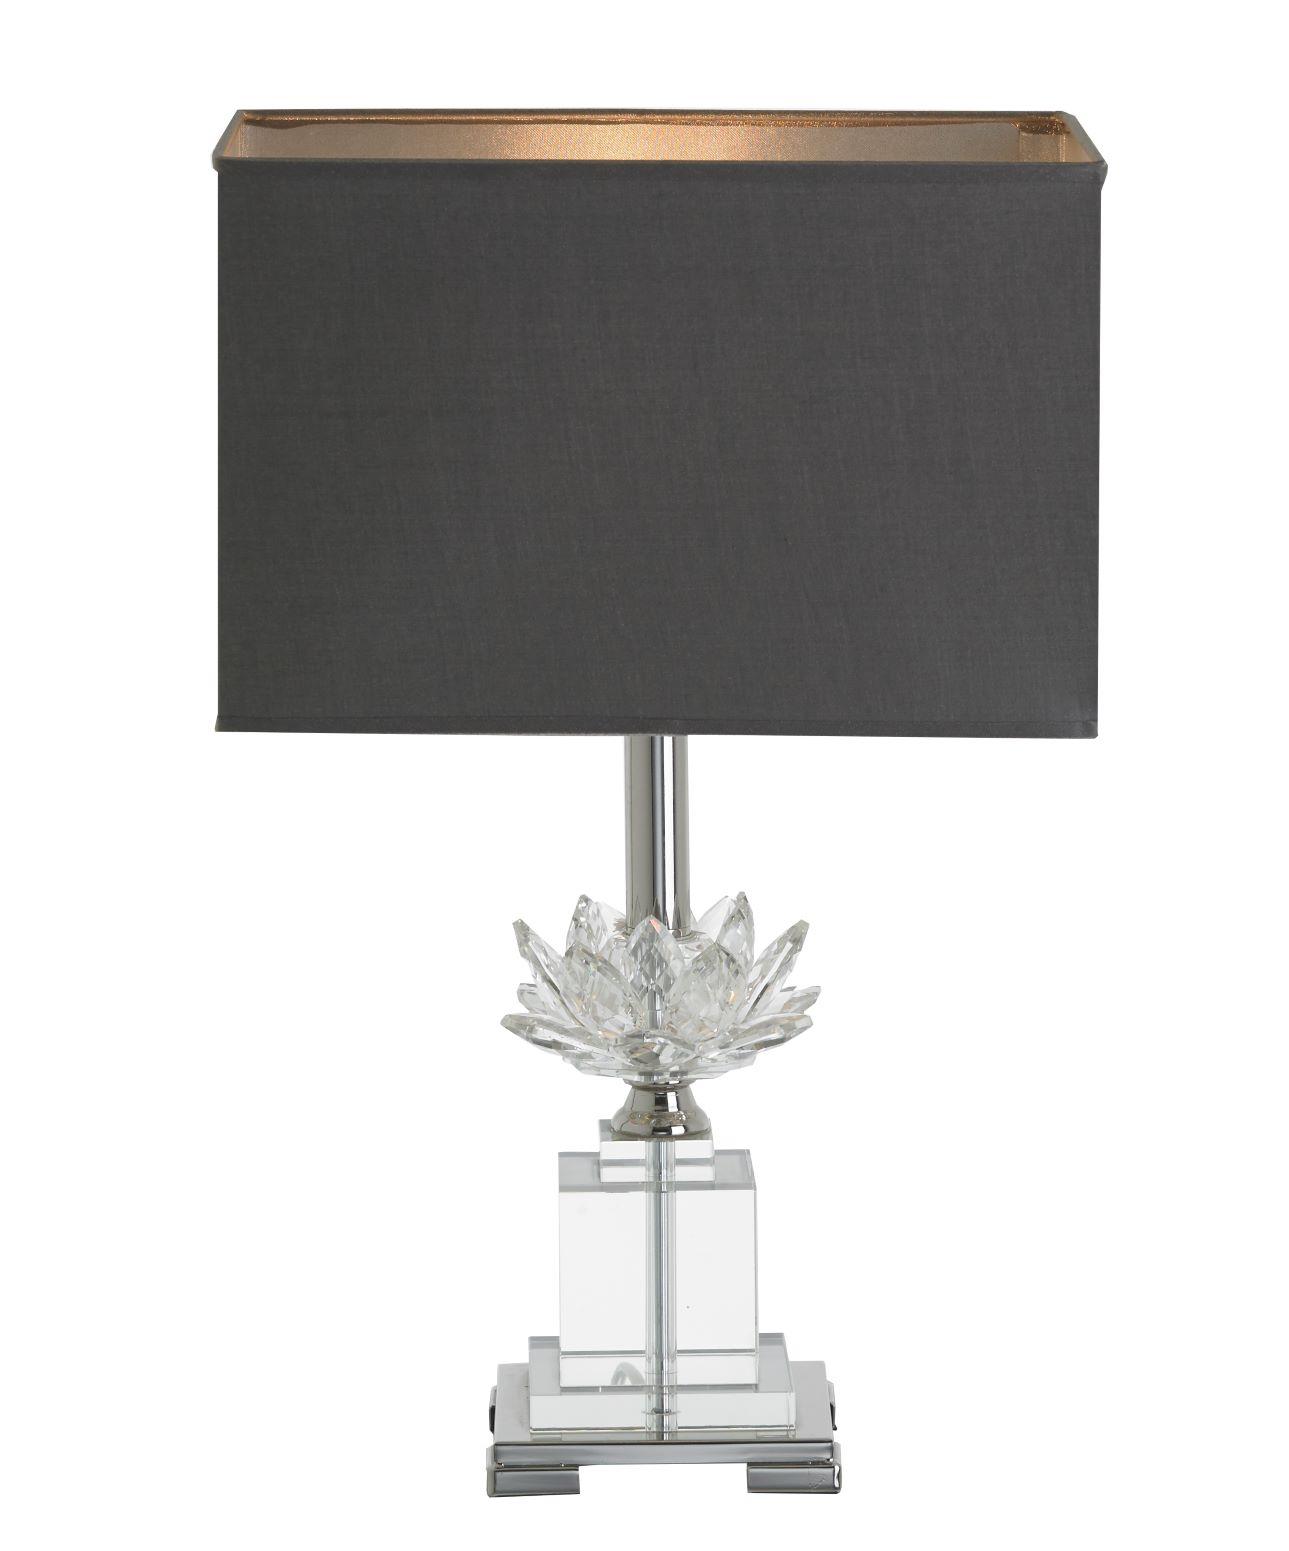 Crystal Lotus Flower Table Lamp Wbr Interiors